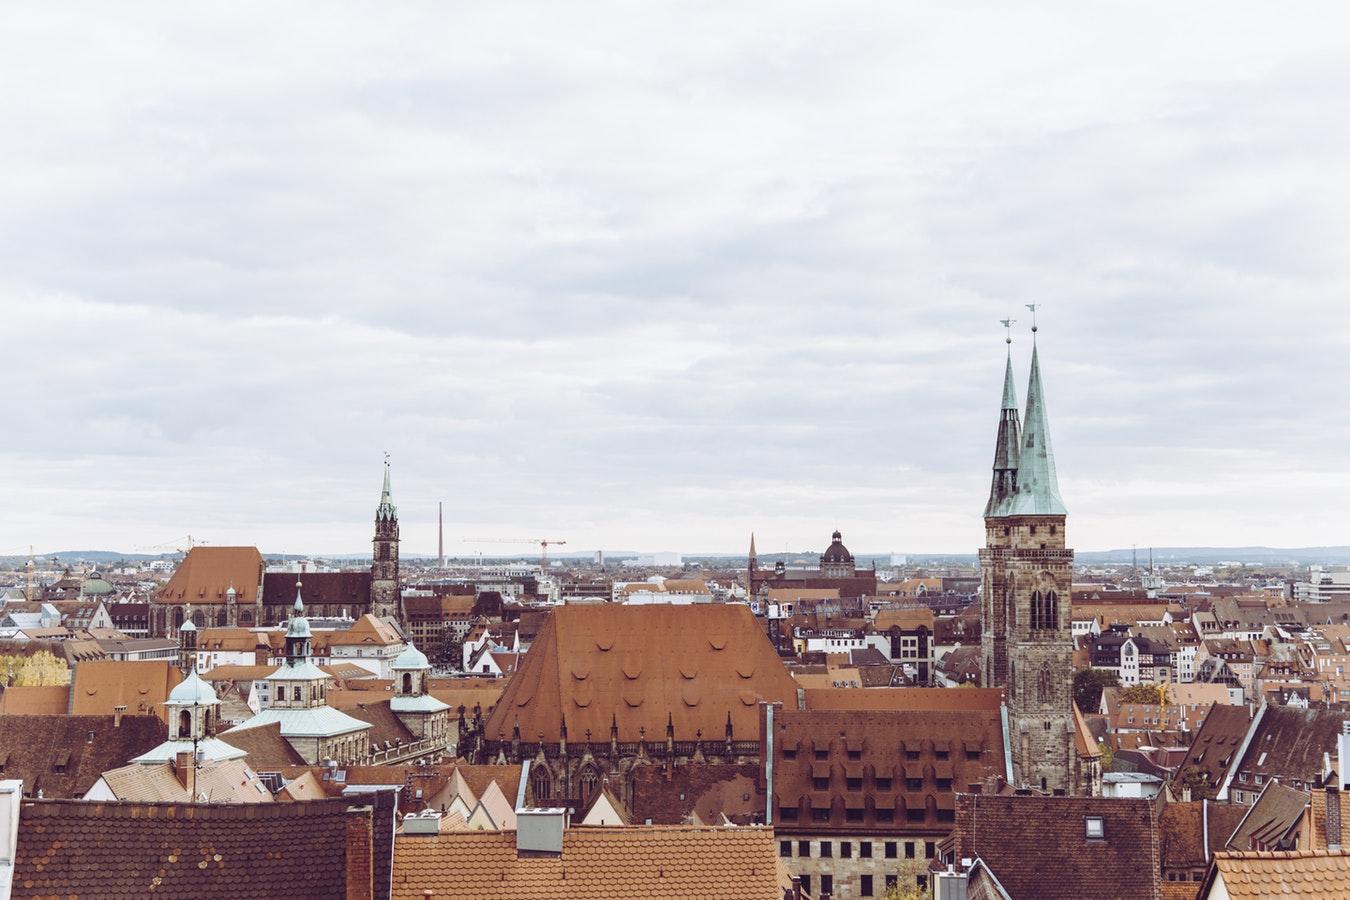 nuremberg skyline